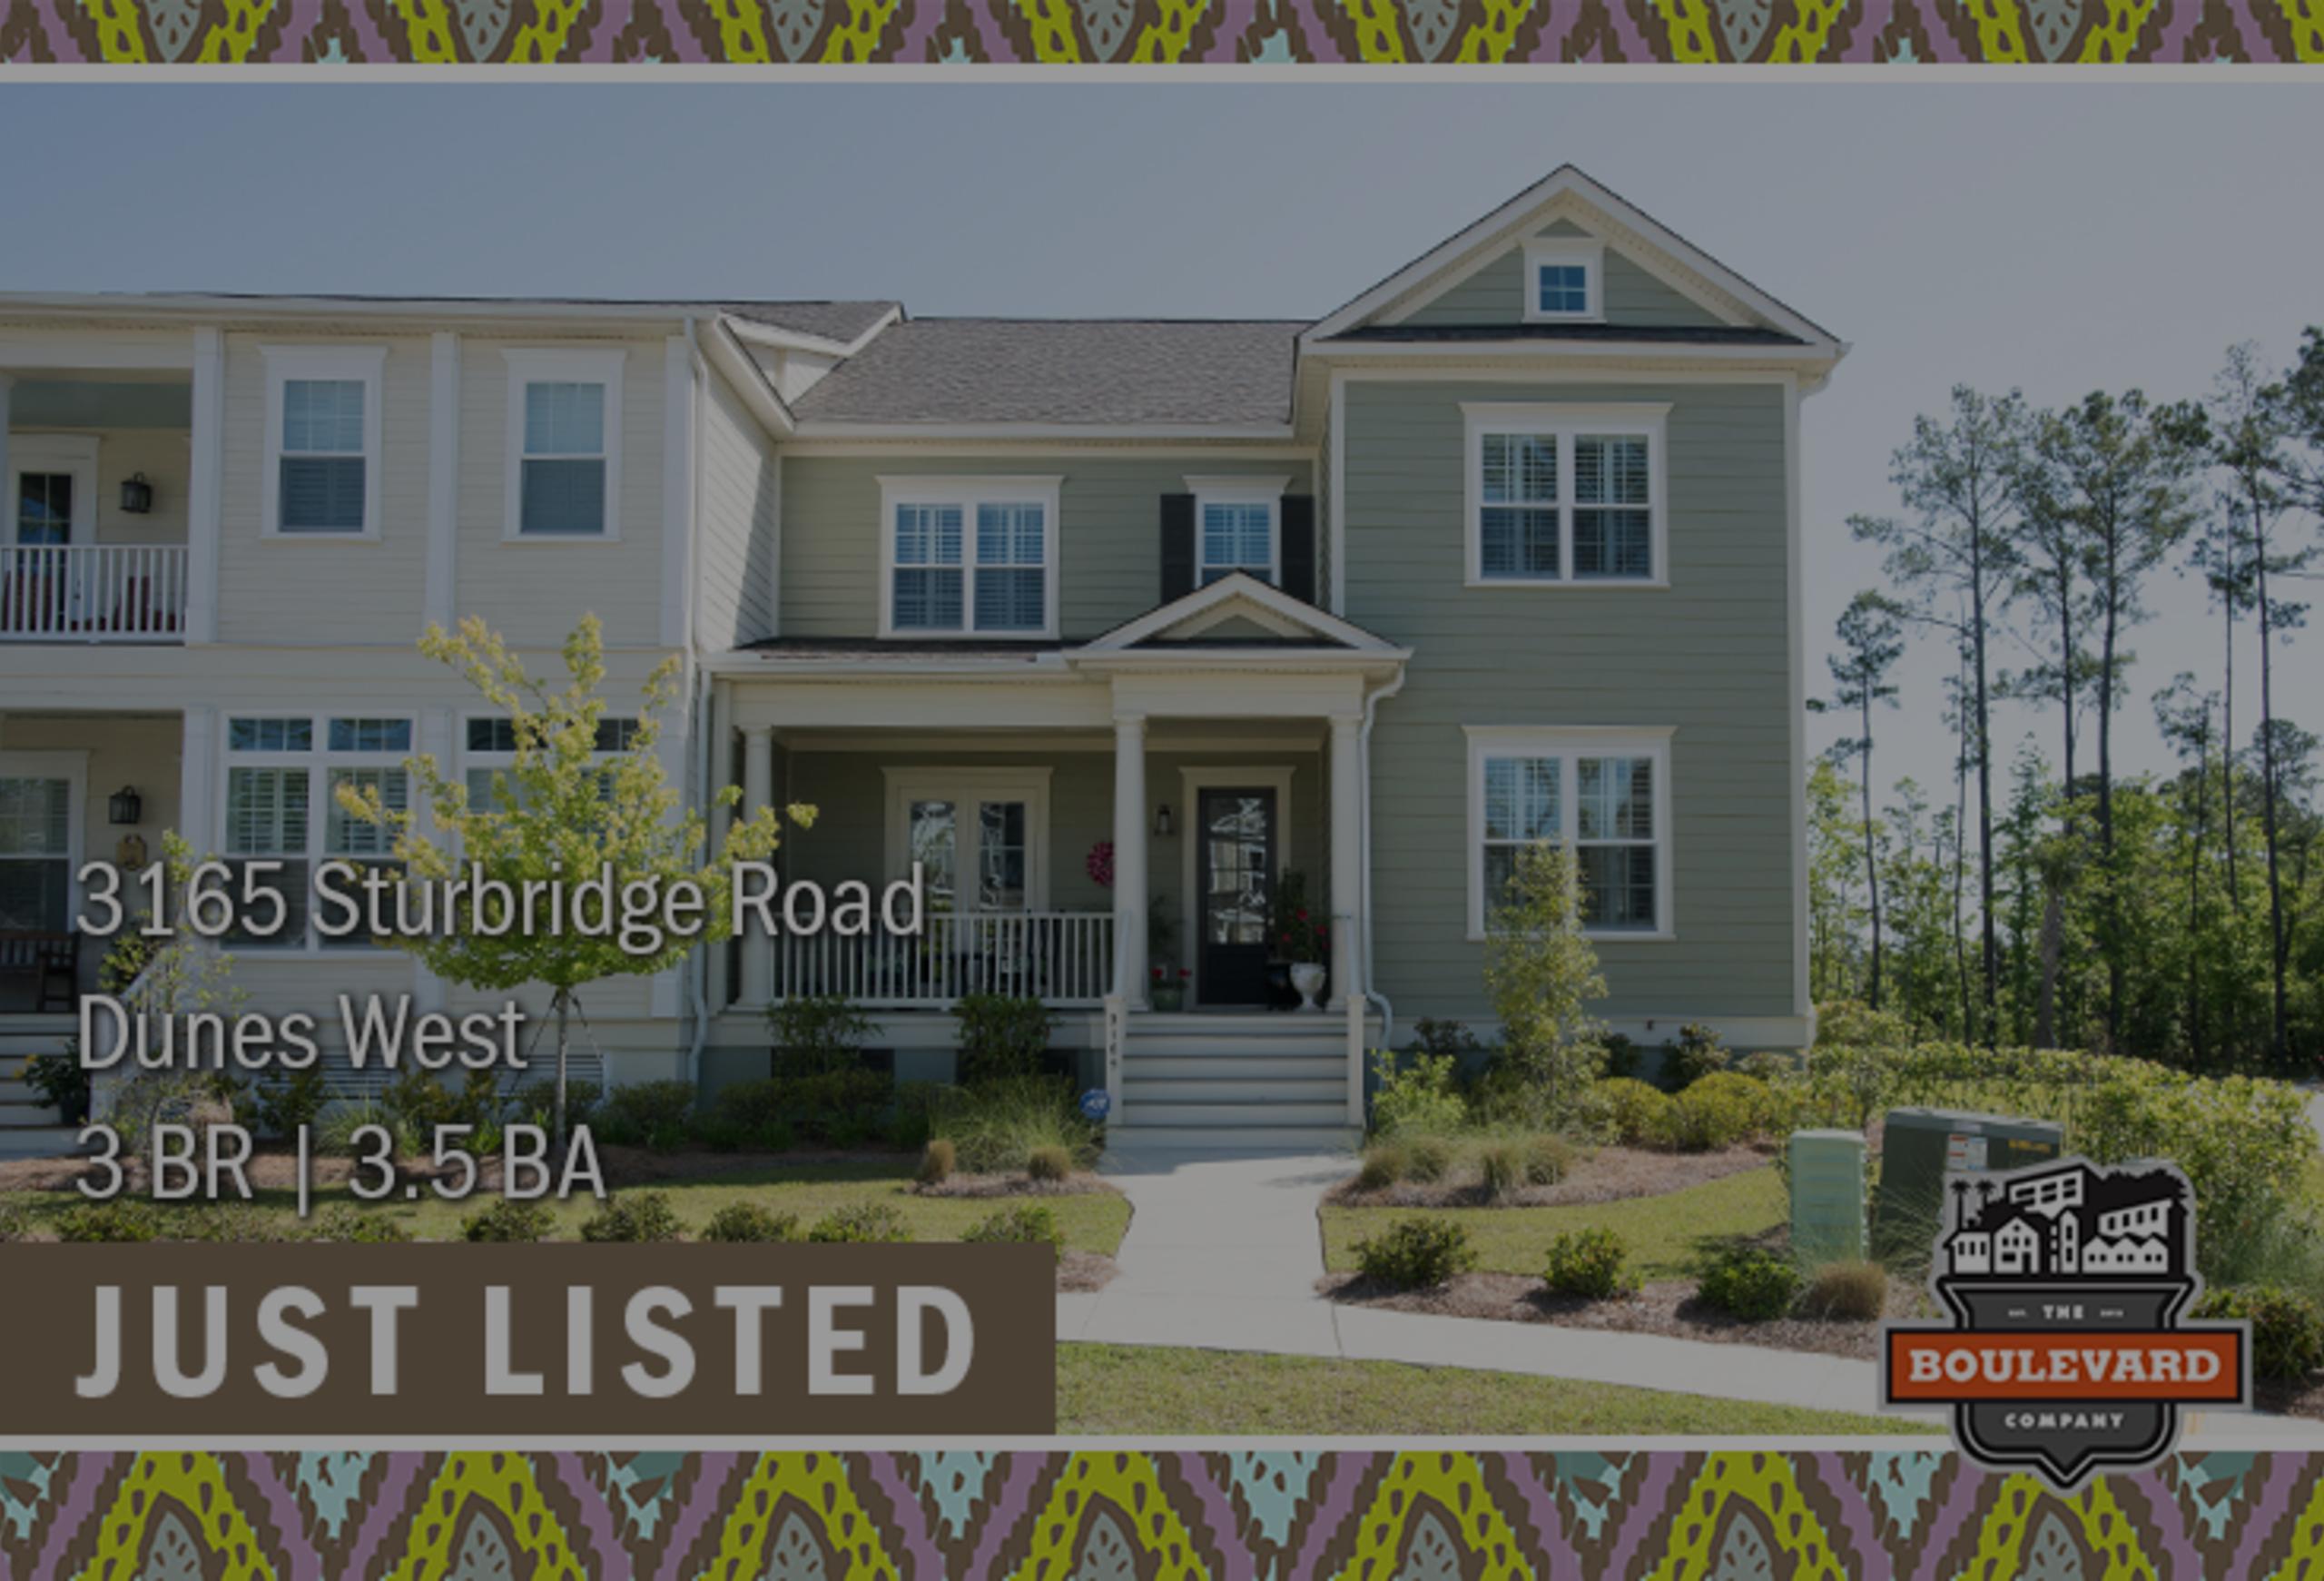 new listing: 3165 Sturbridge Road in Dunes West